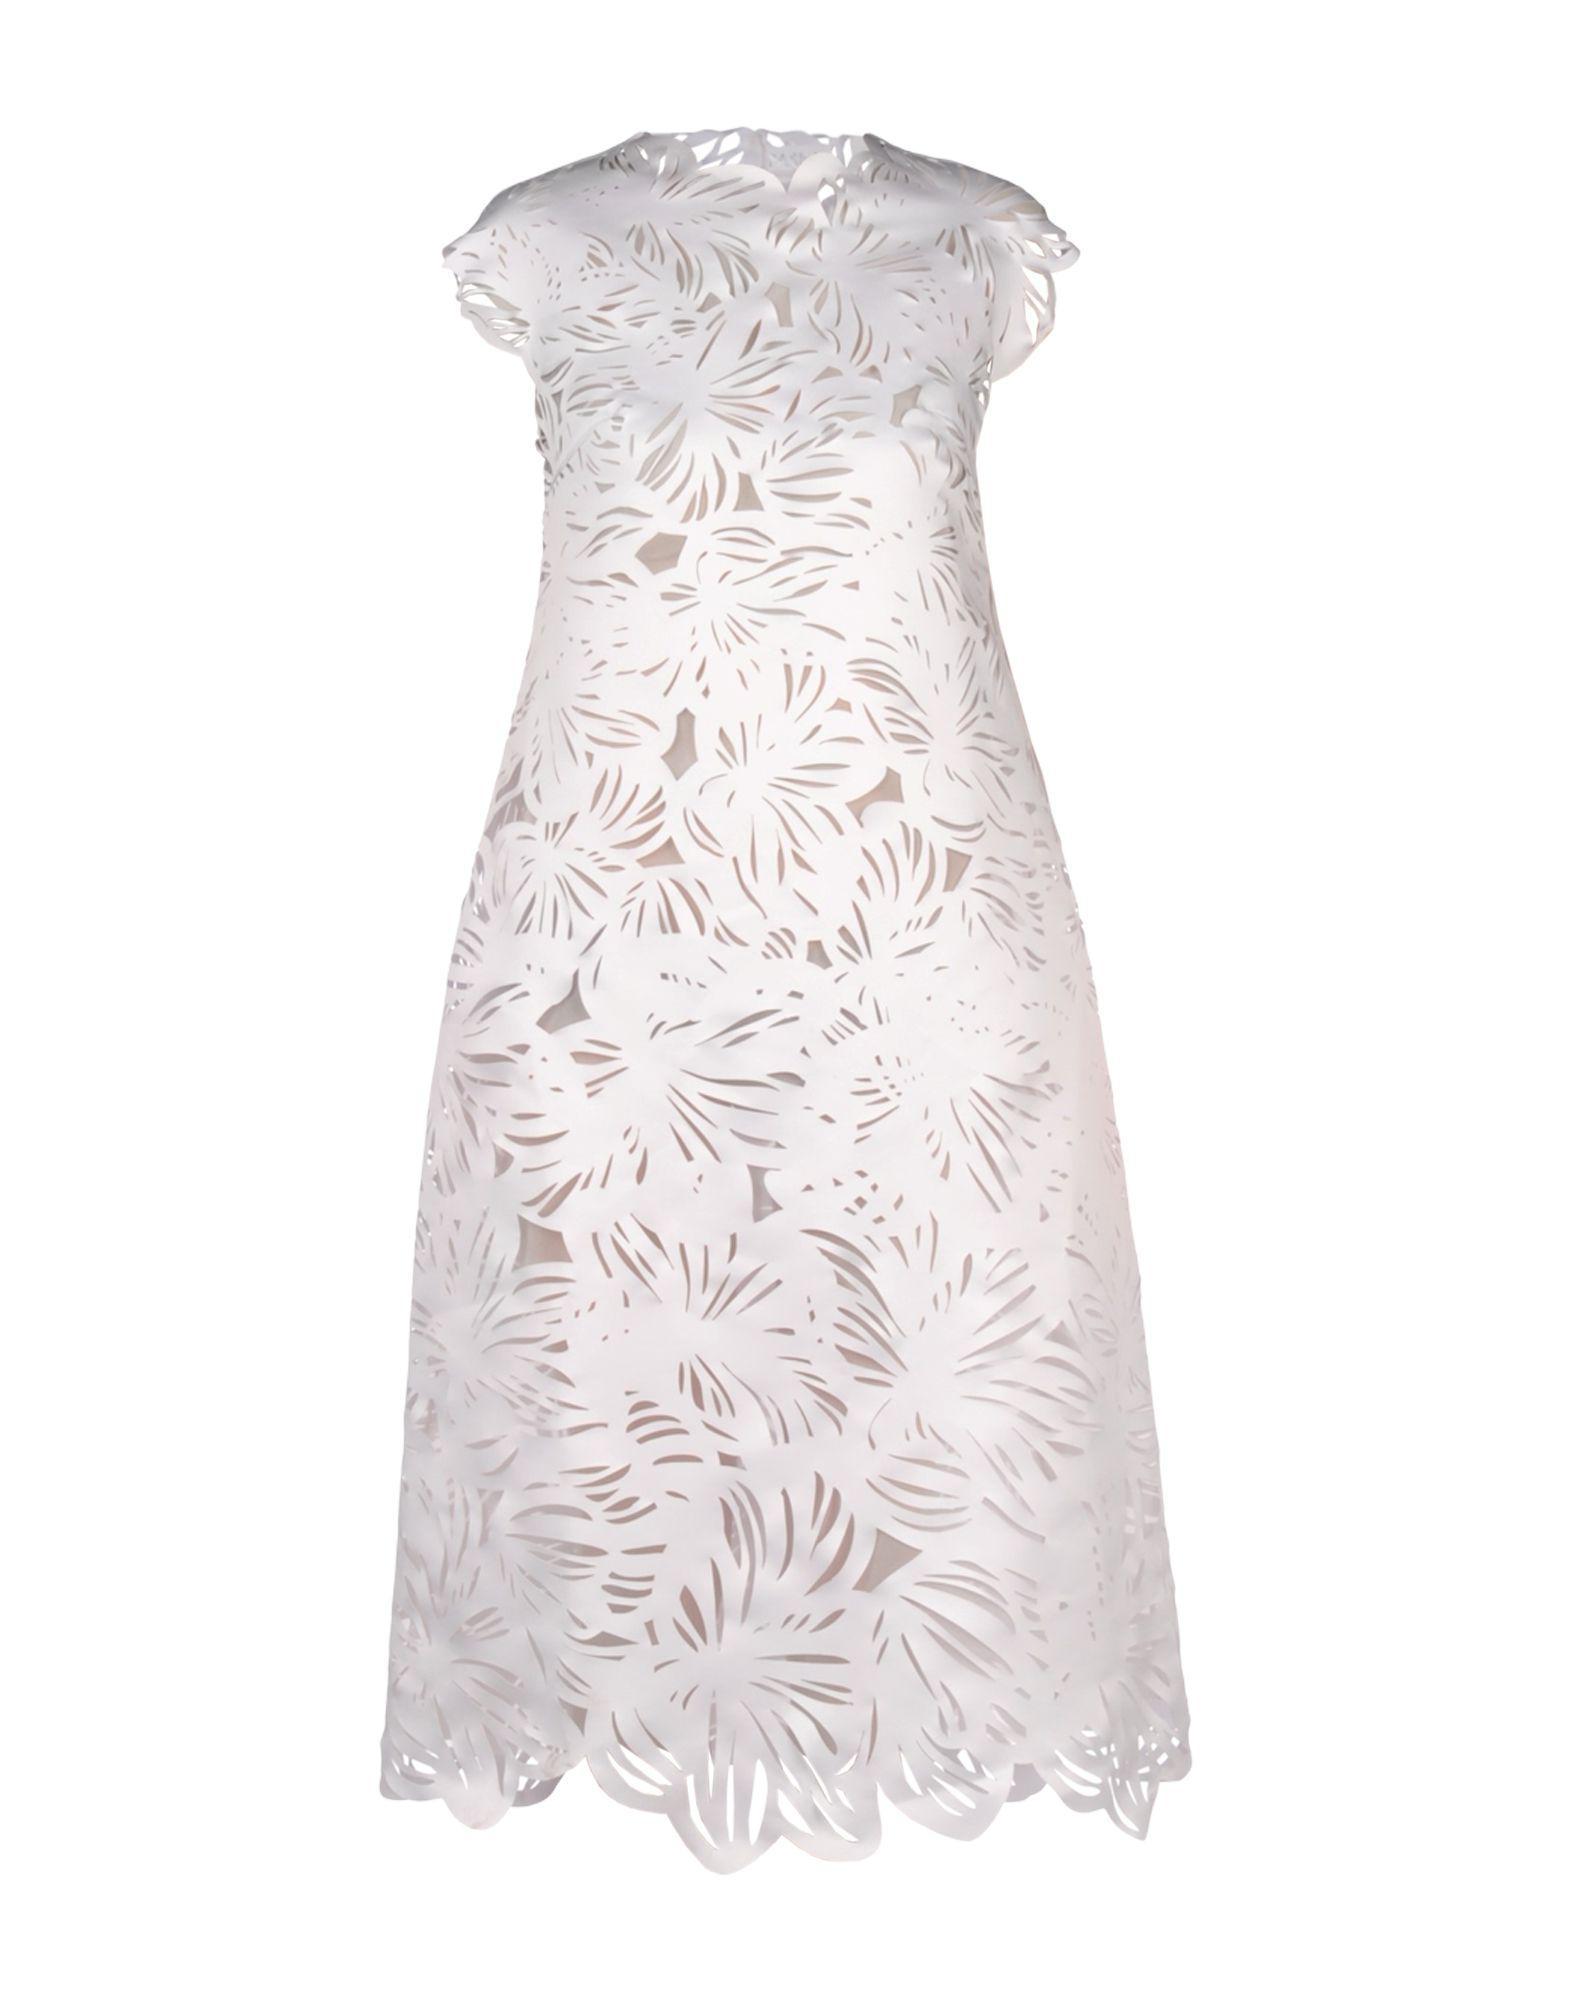 DRESSES - 3/4 length dresses Paskal 3MeObk3vEr